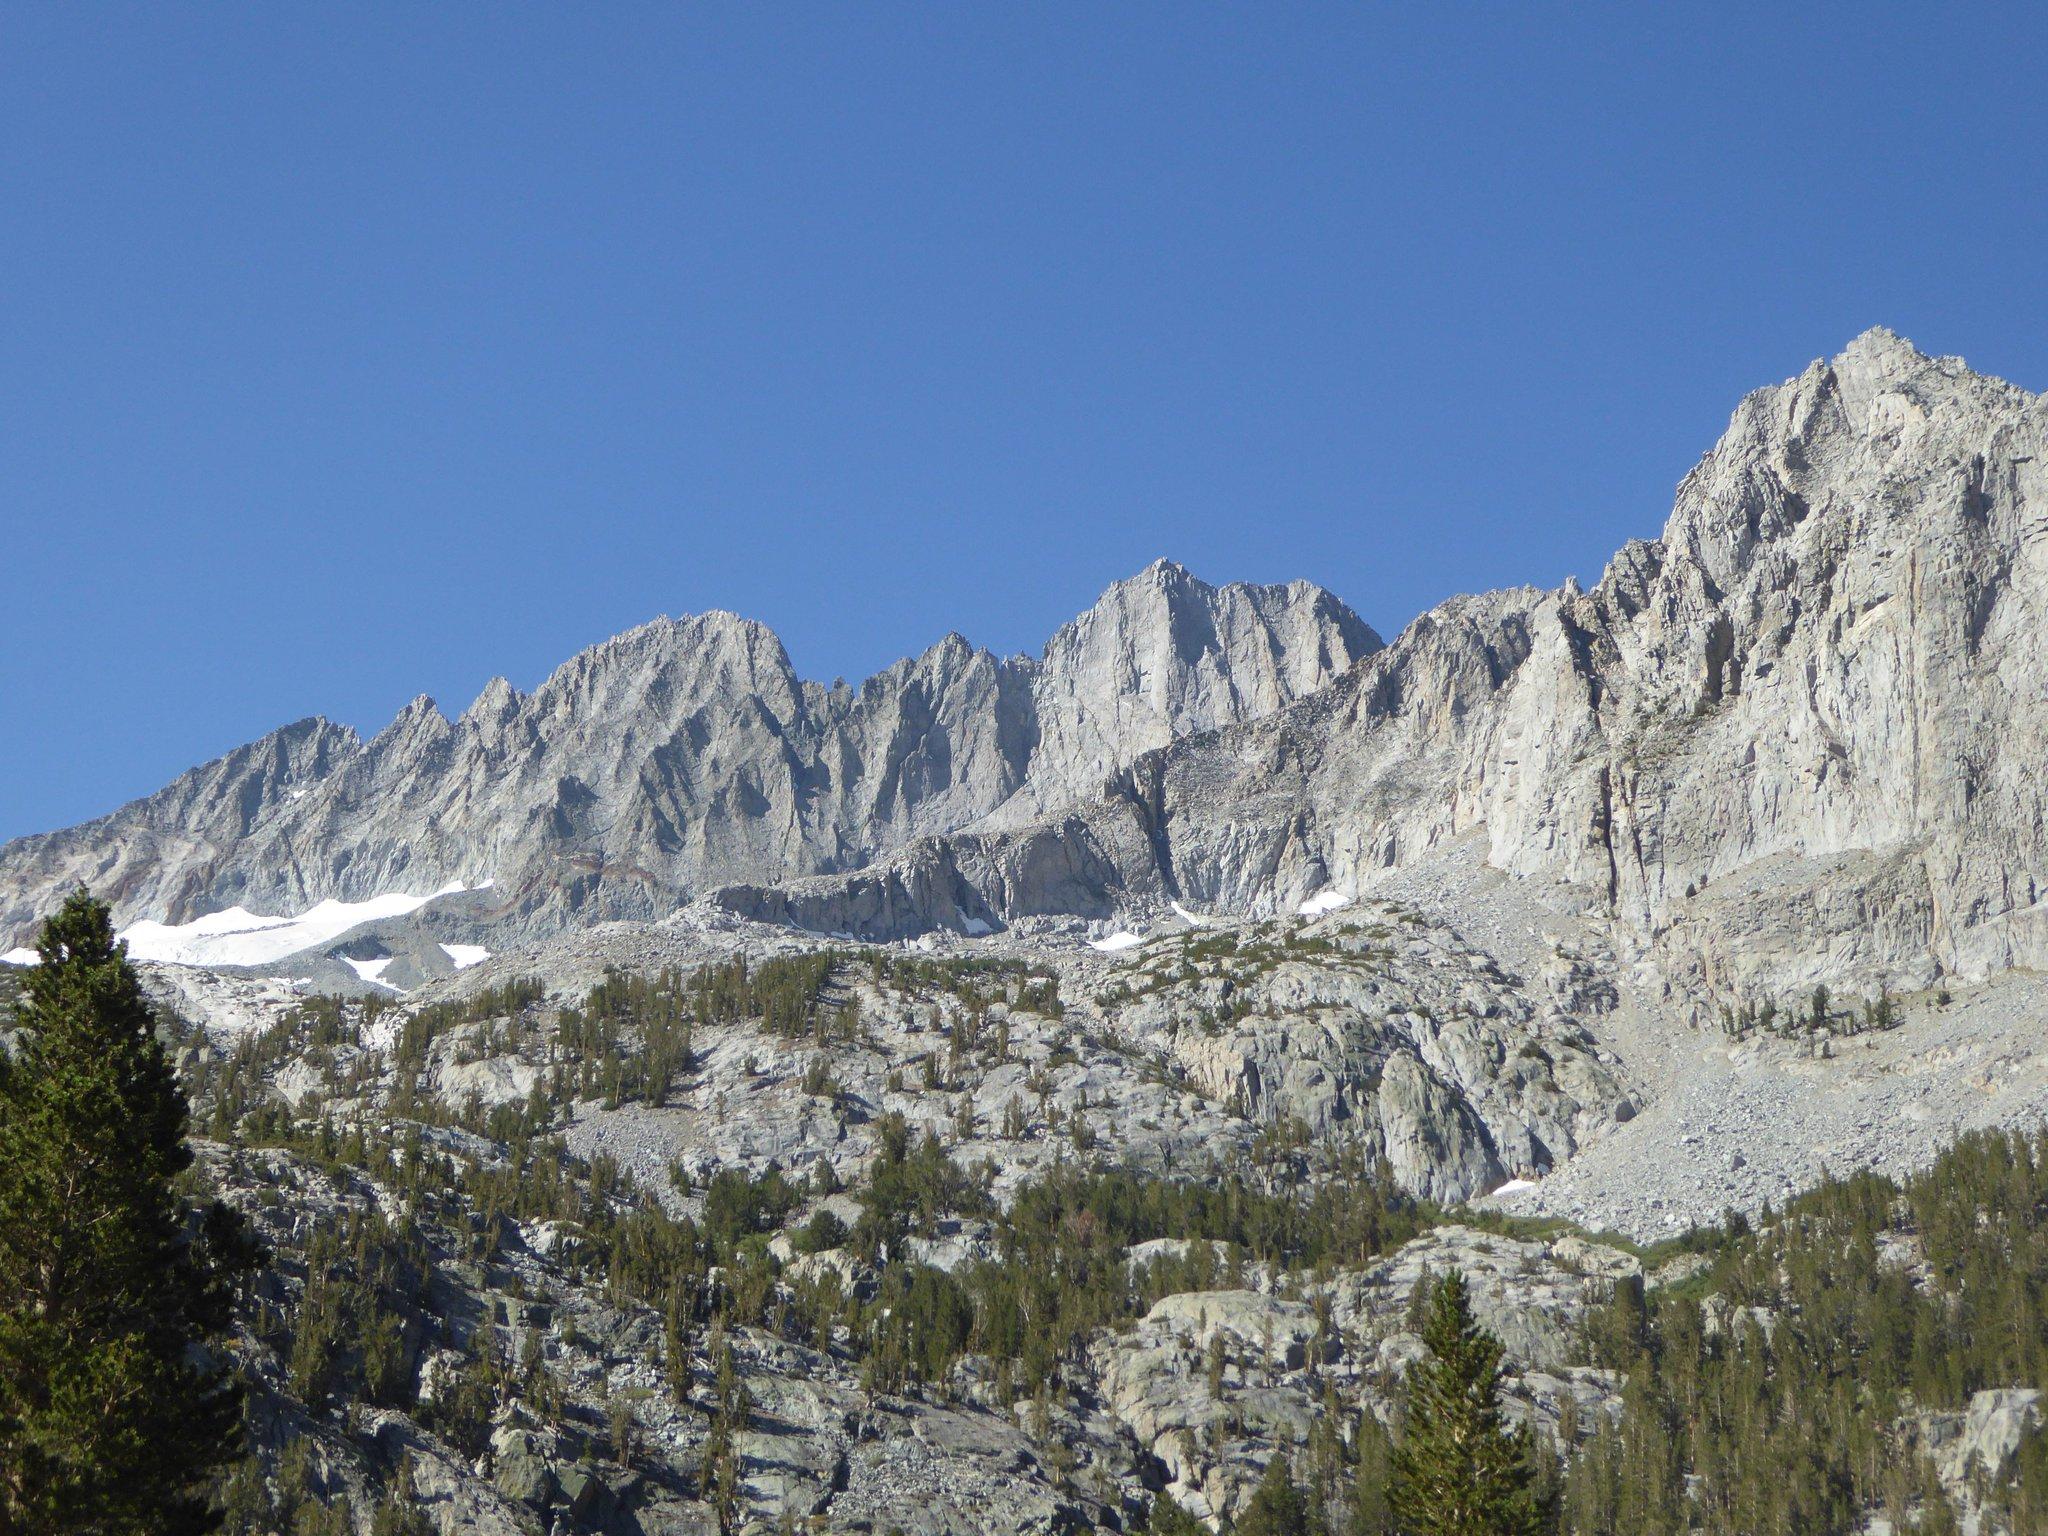 High Sierra Topix On Twitter Tr South Fork Big Pine Creek August 13 14 2016 Https T Co Ae9gekfpnu